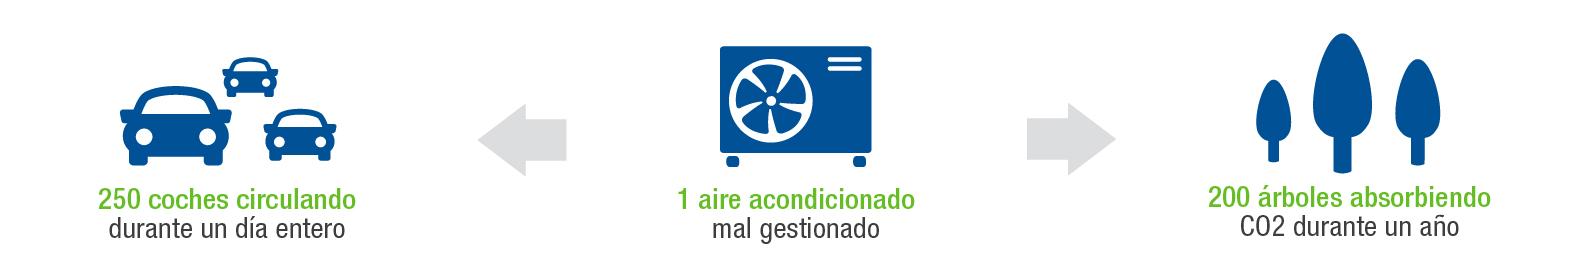 aire-acondicionado-polucion